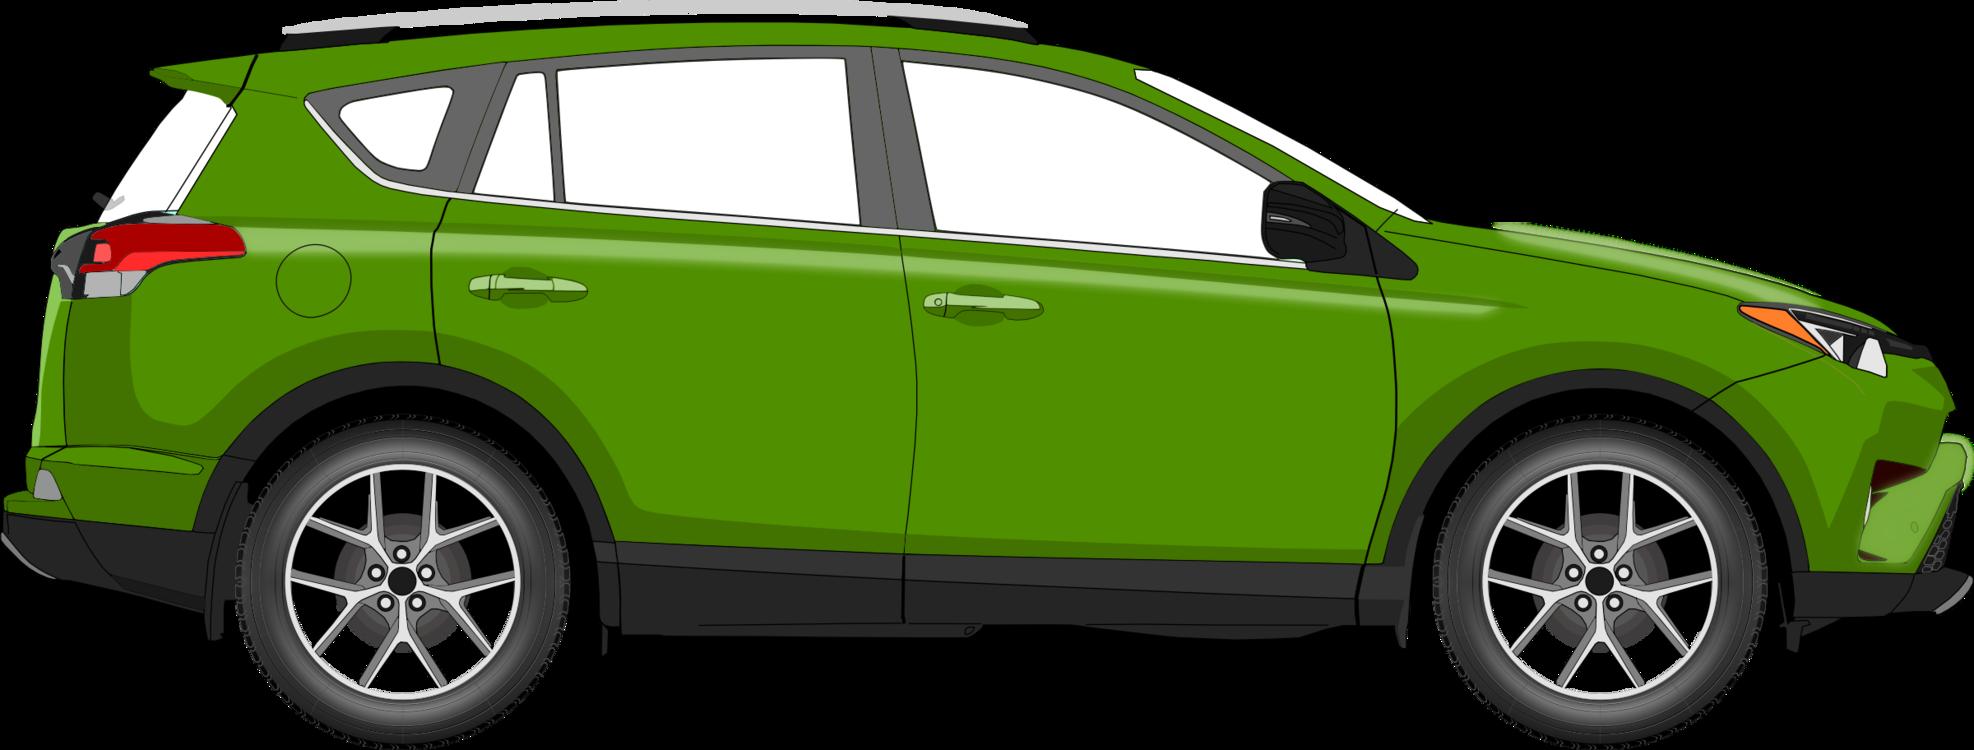 Rav4 clipart vector freeuse library Wheel,Automotive Exterior,Compact Car Clipart - Royalty Free ... vector freeuse library